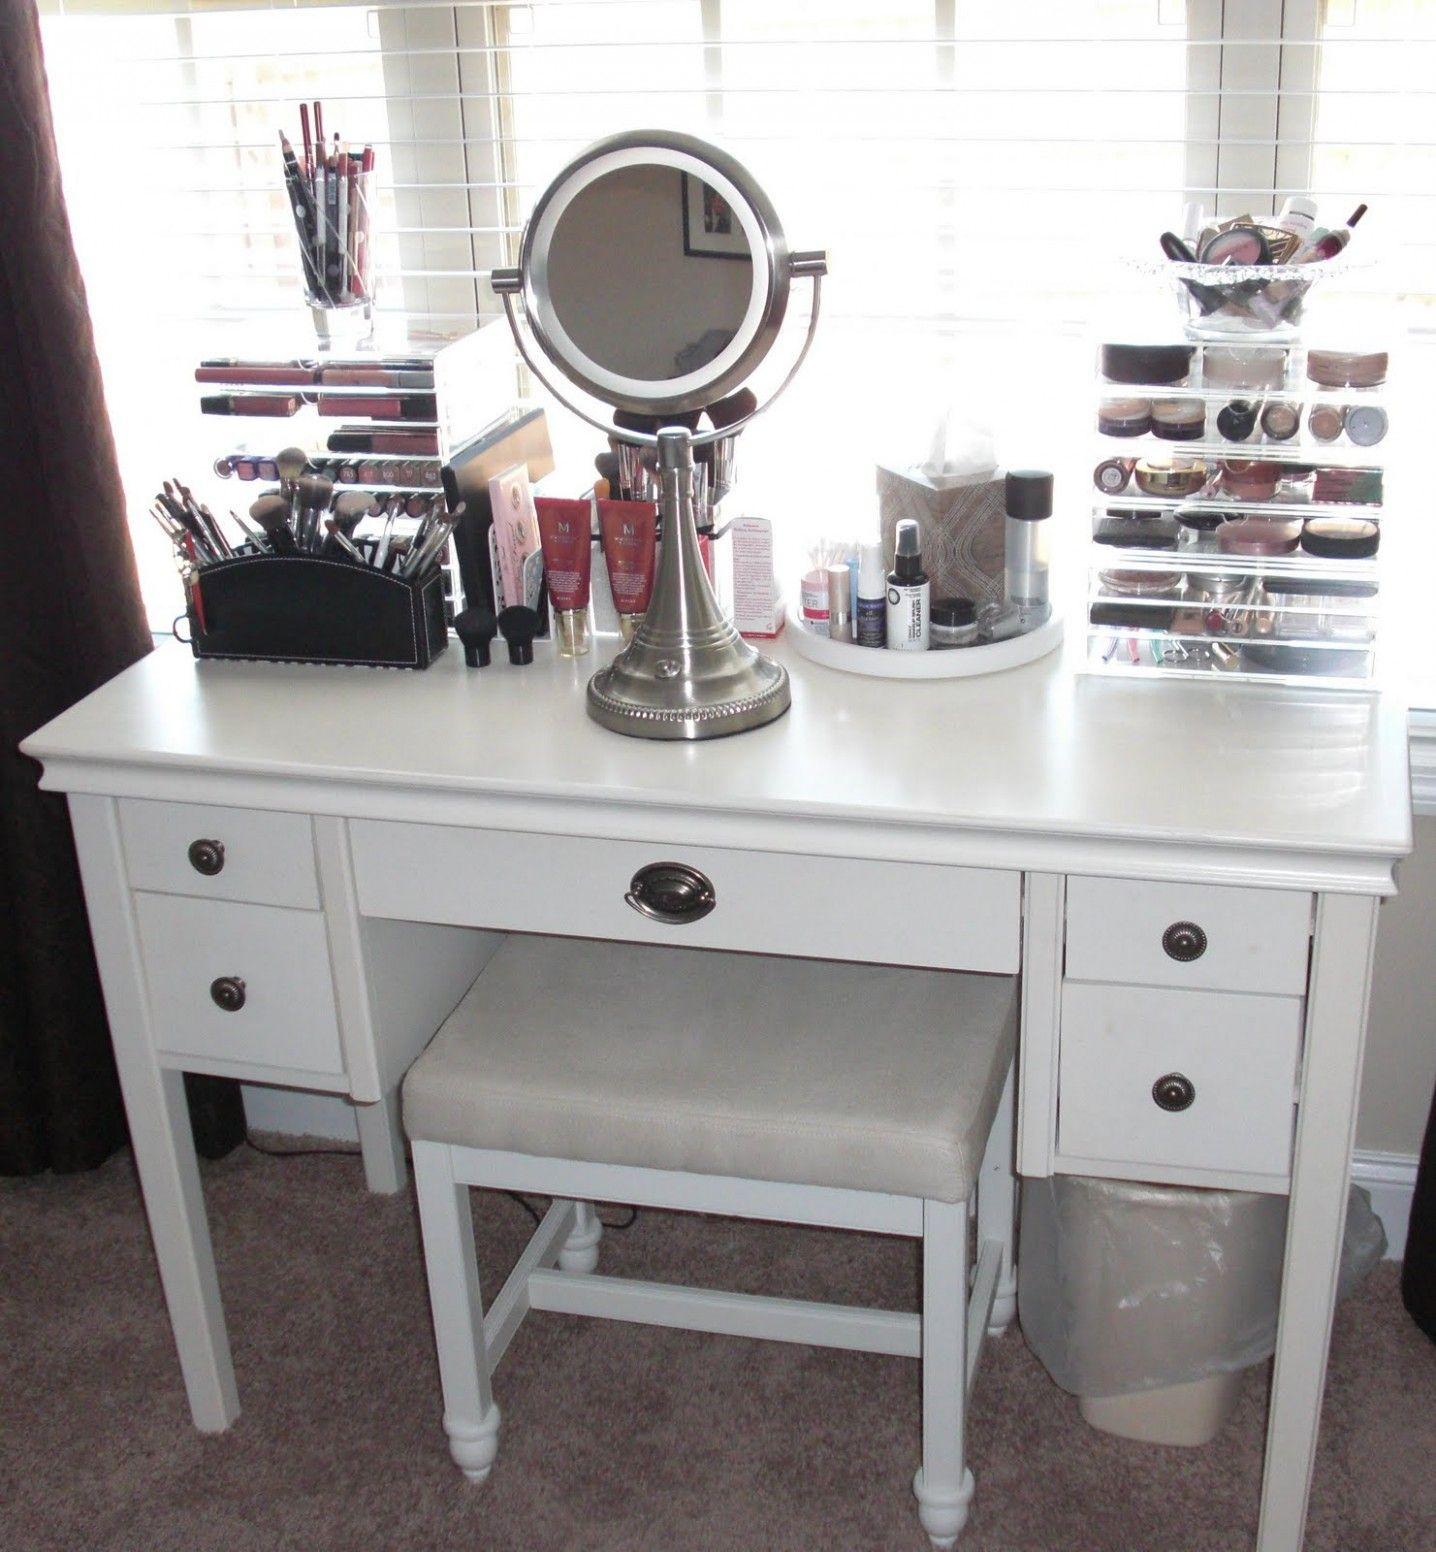 Bedroom Vanity Sets Canada In 2020 Vanity Set Up Makeup Vanity